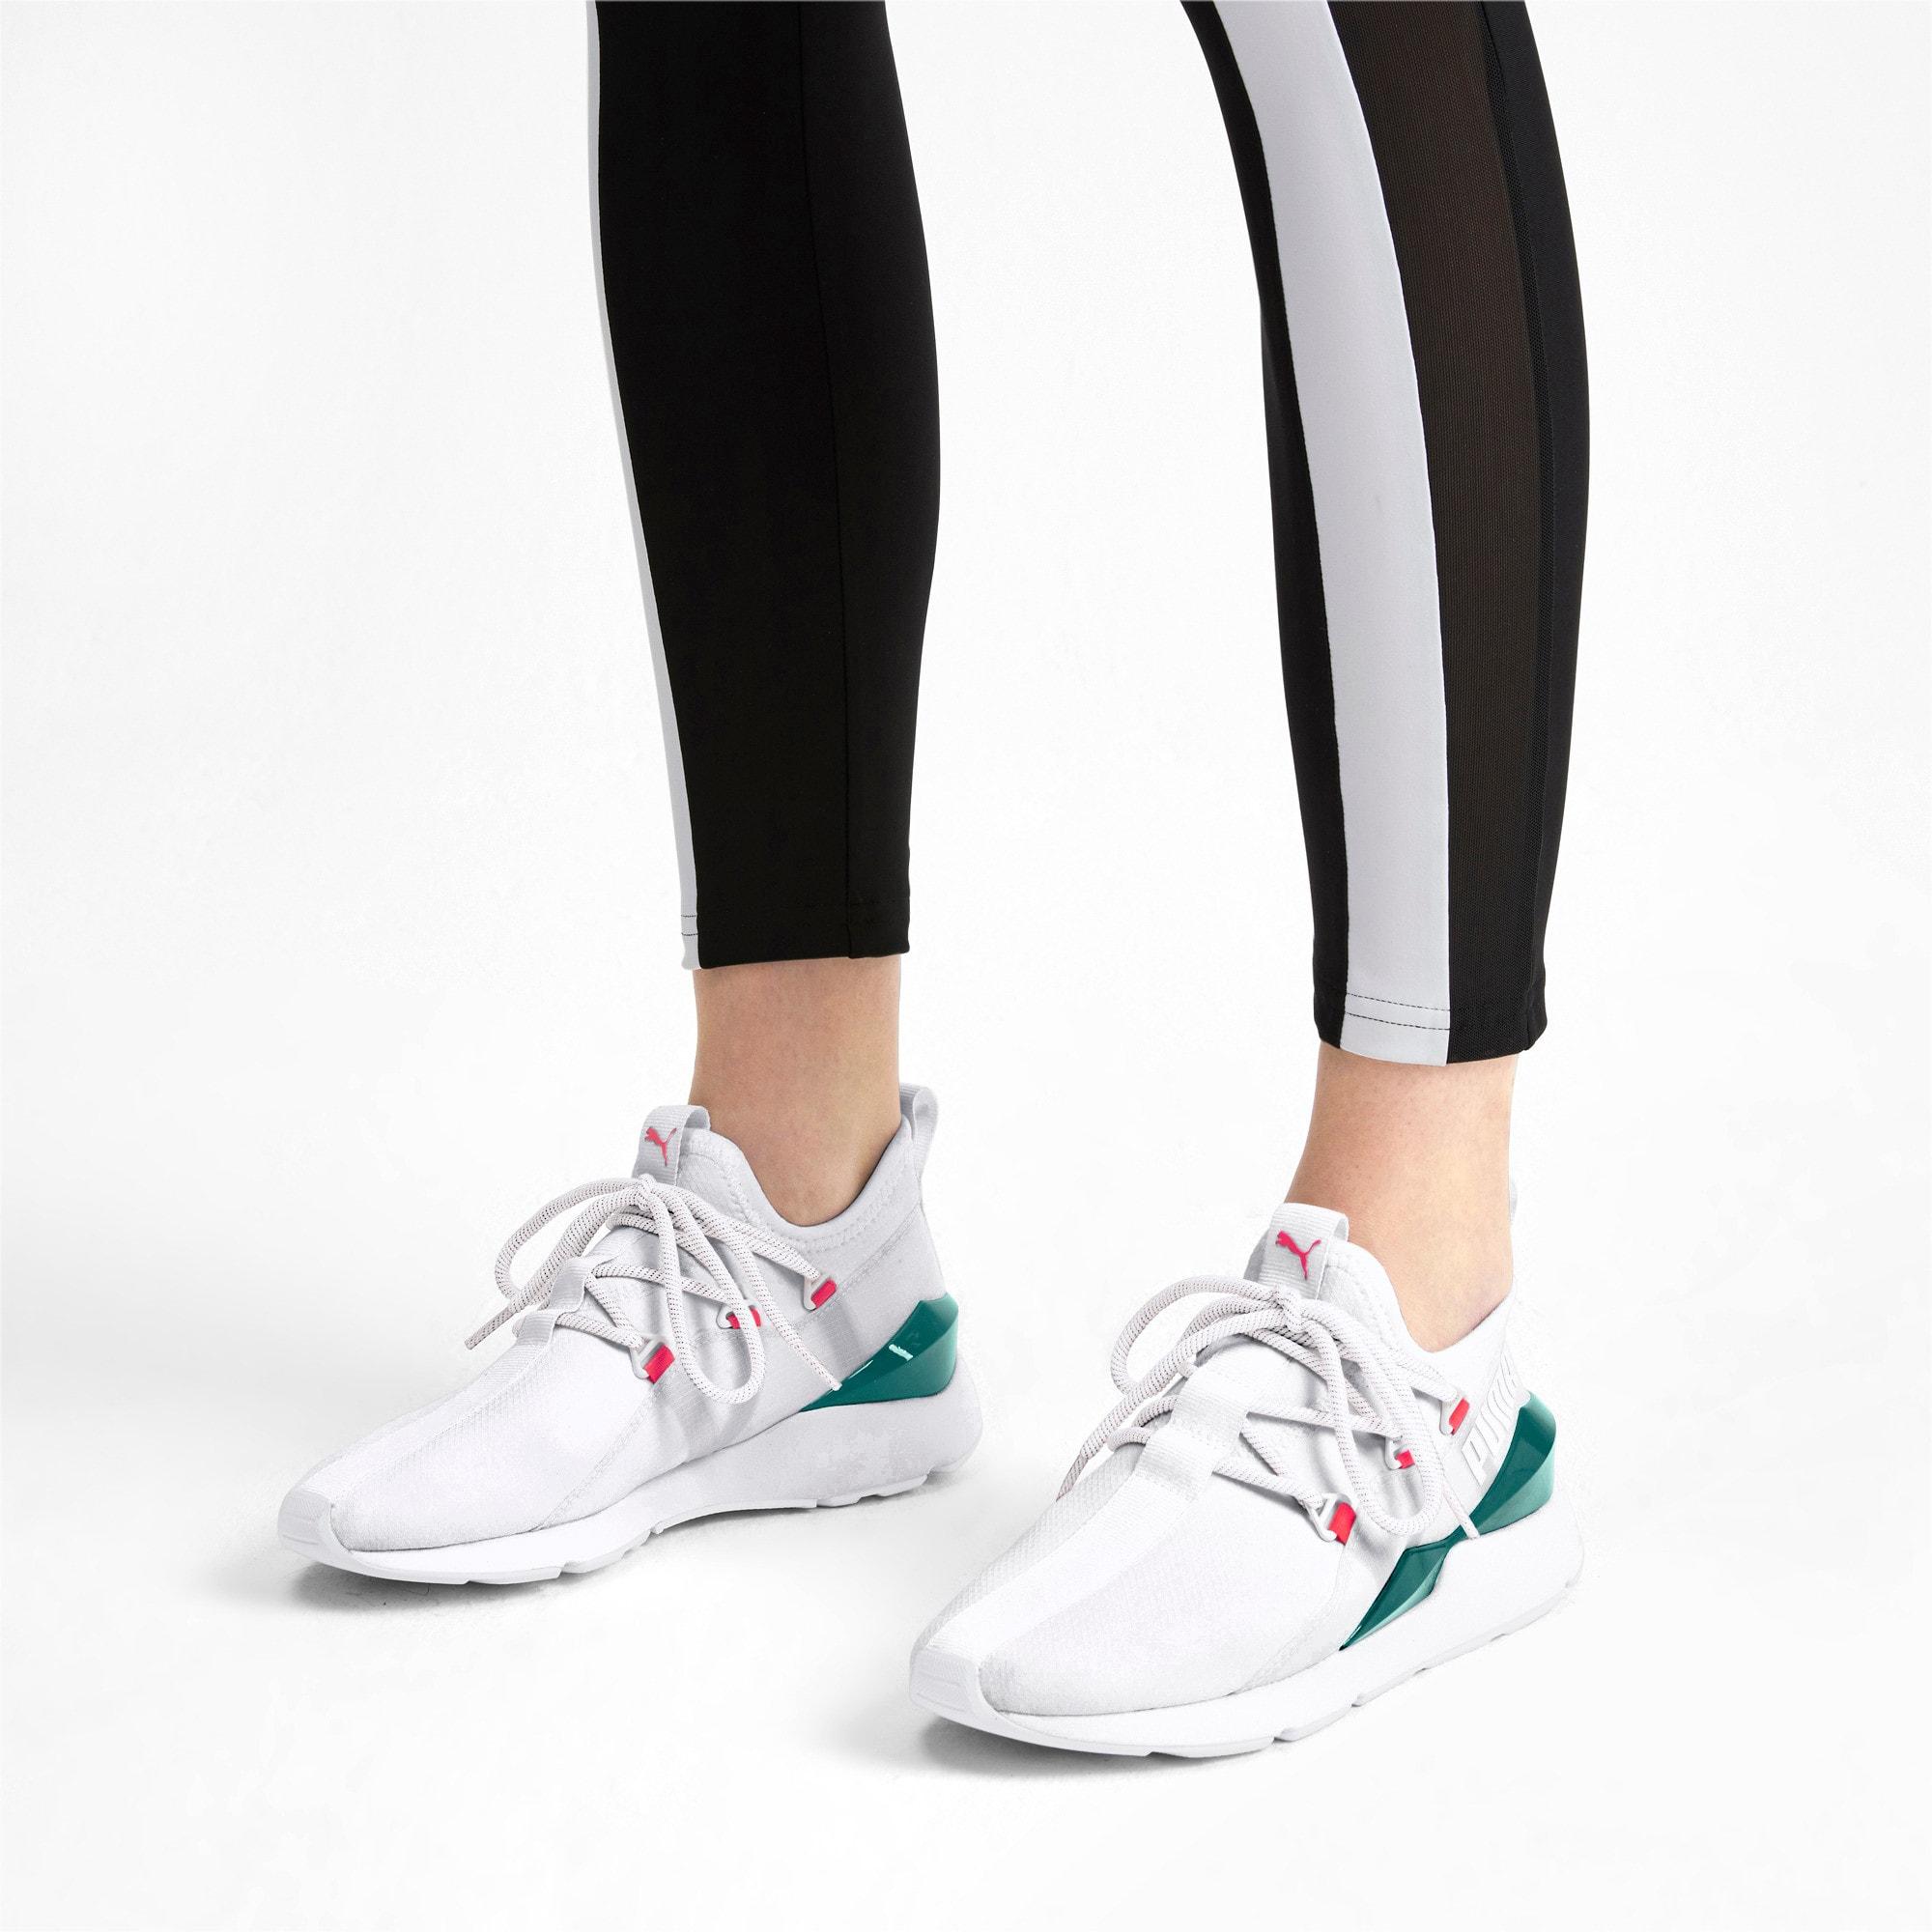 Thumbnail 2 of Muse 2 Hypertech Women's Sneakers, Puma White-Pink Alert, medium